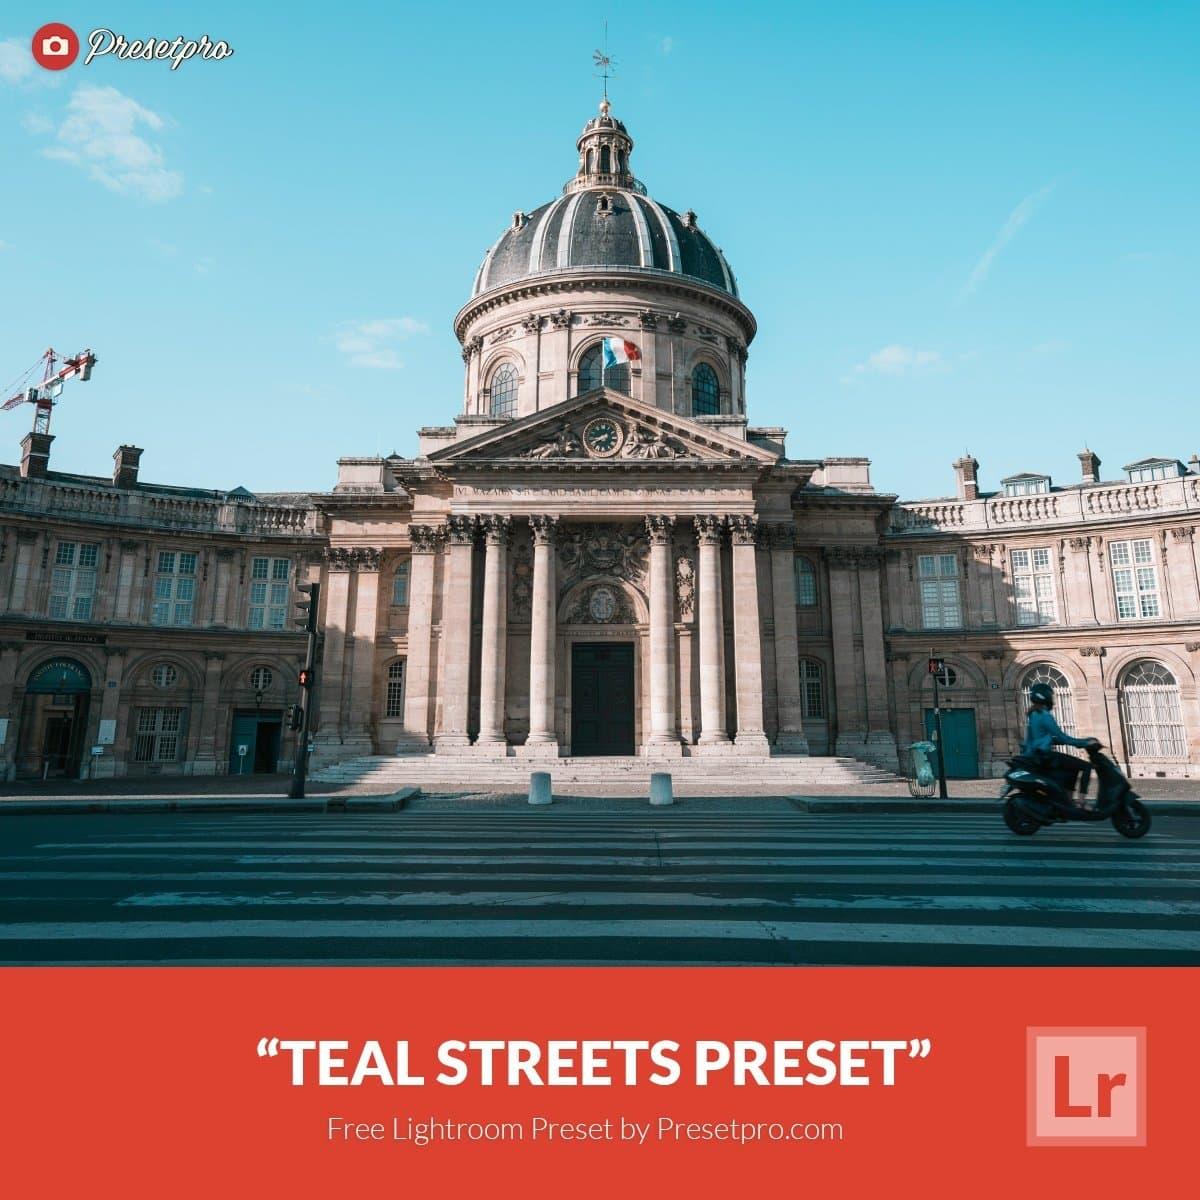 Free-Lightroom-Preset-Teal-Streets-Presetpro.com